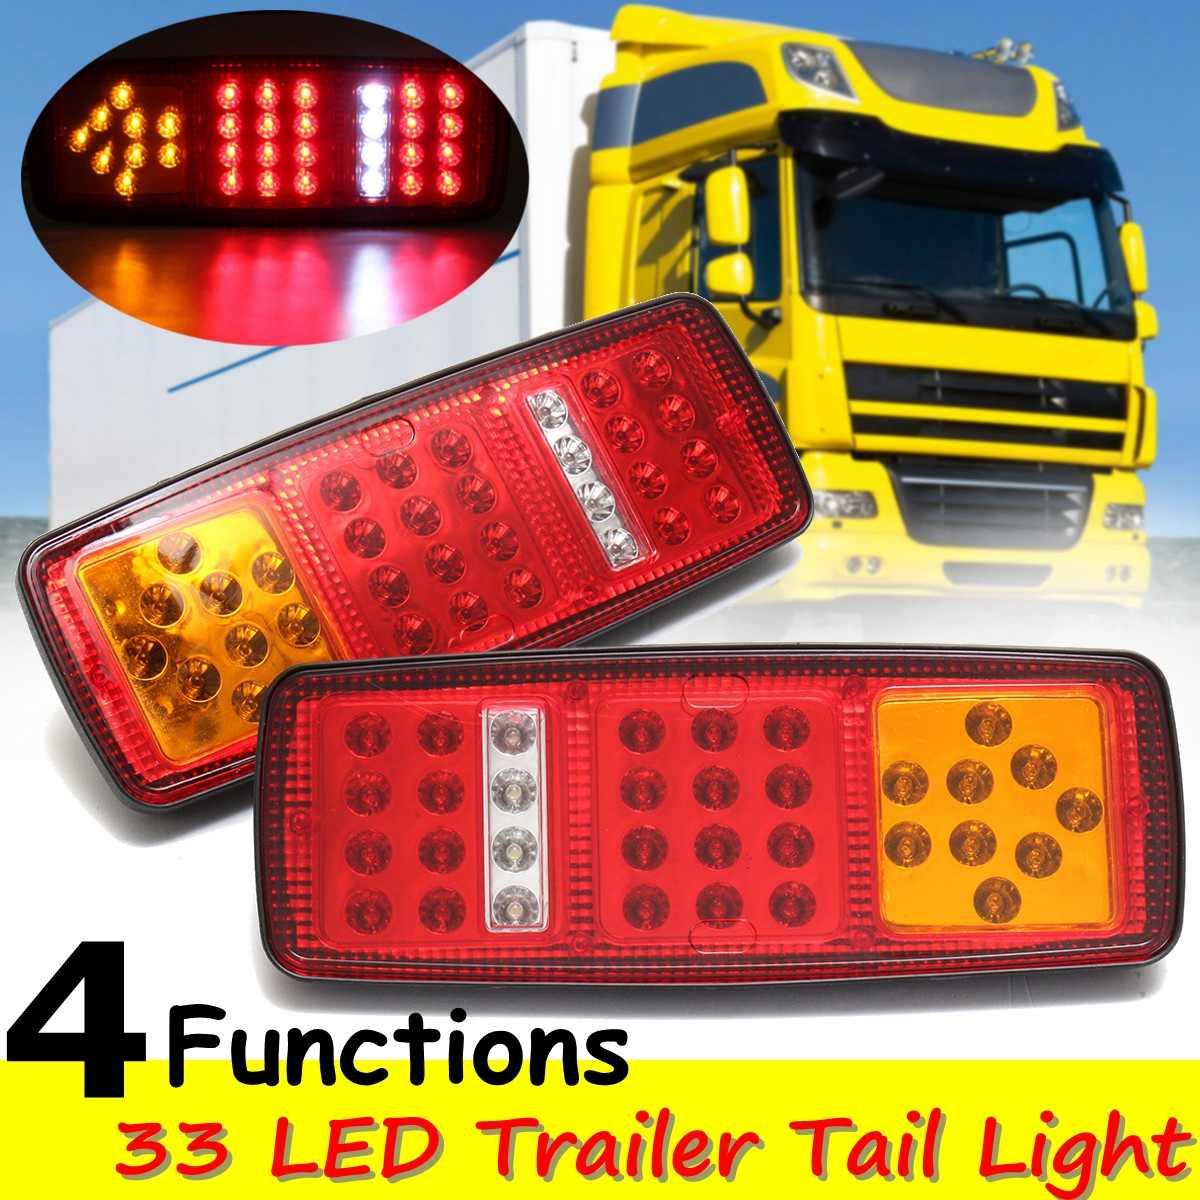 Par 12V Universal coche camión 33LED luz de freno trasero luces indicadoras de señal de giro luz trasera de marcha atrás para remolque camión autobús Van